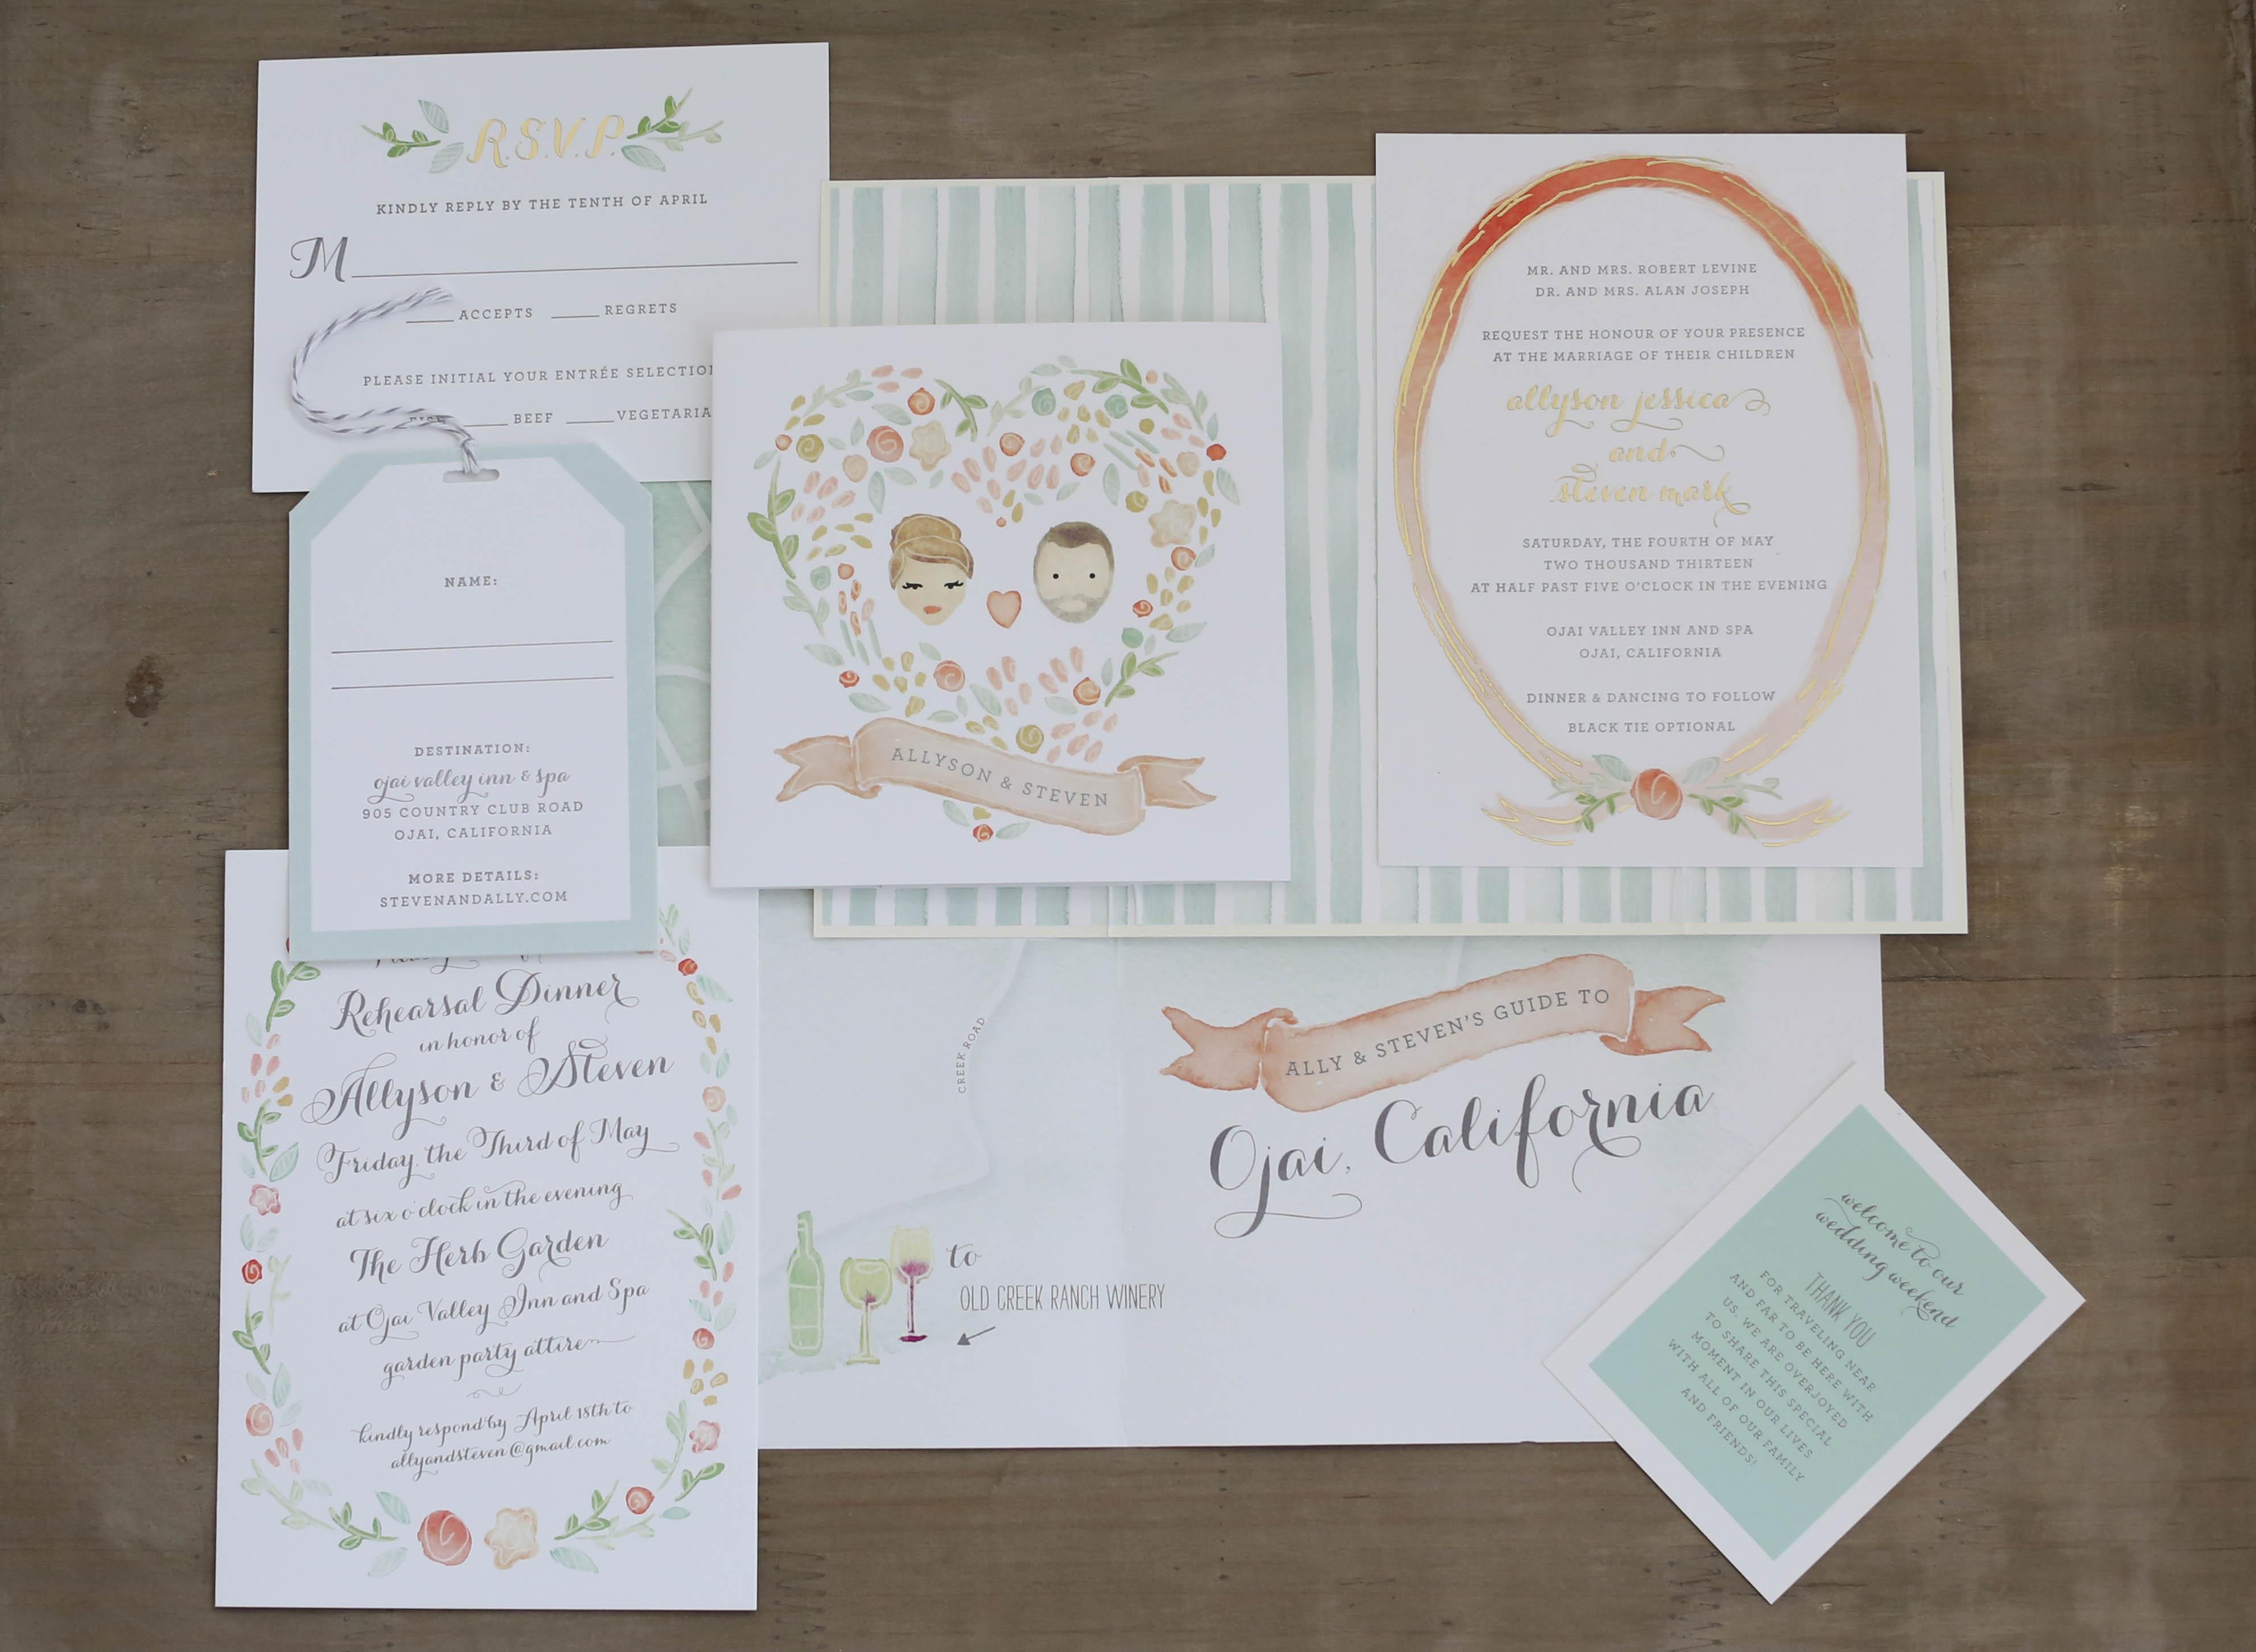 Pastel green and pastel orange watercolor wedding invitations